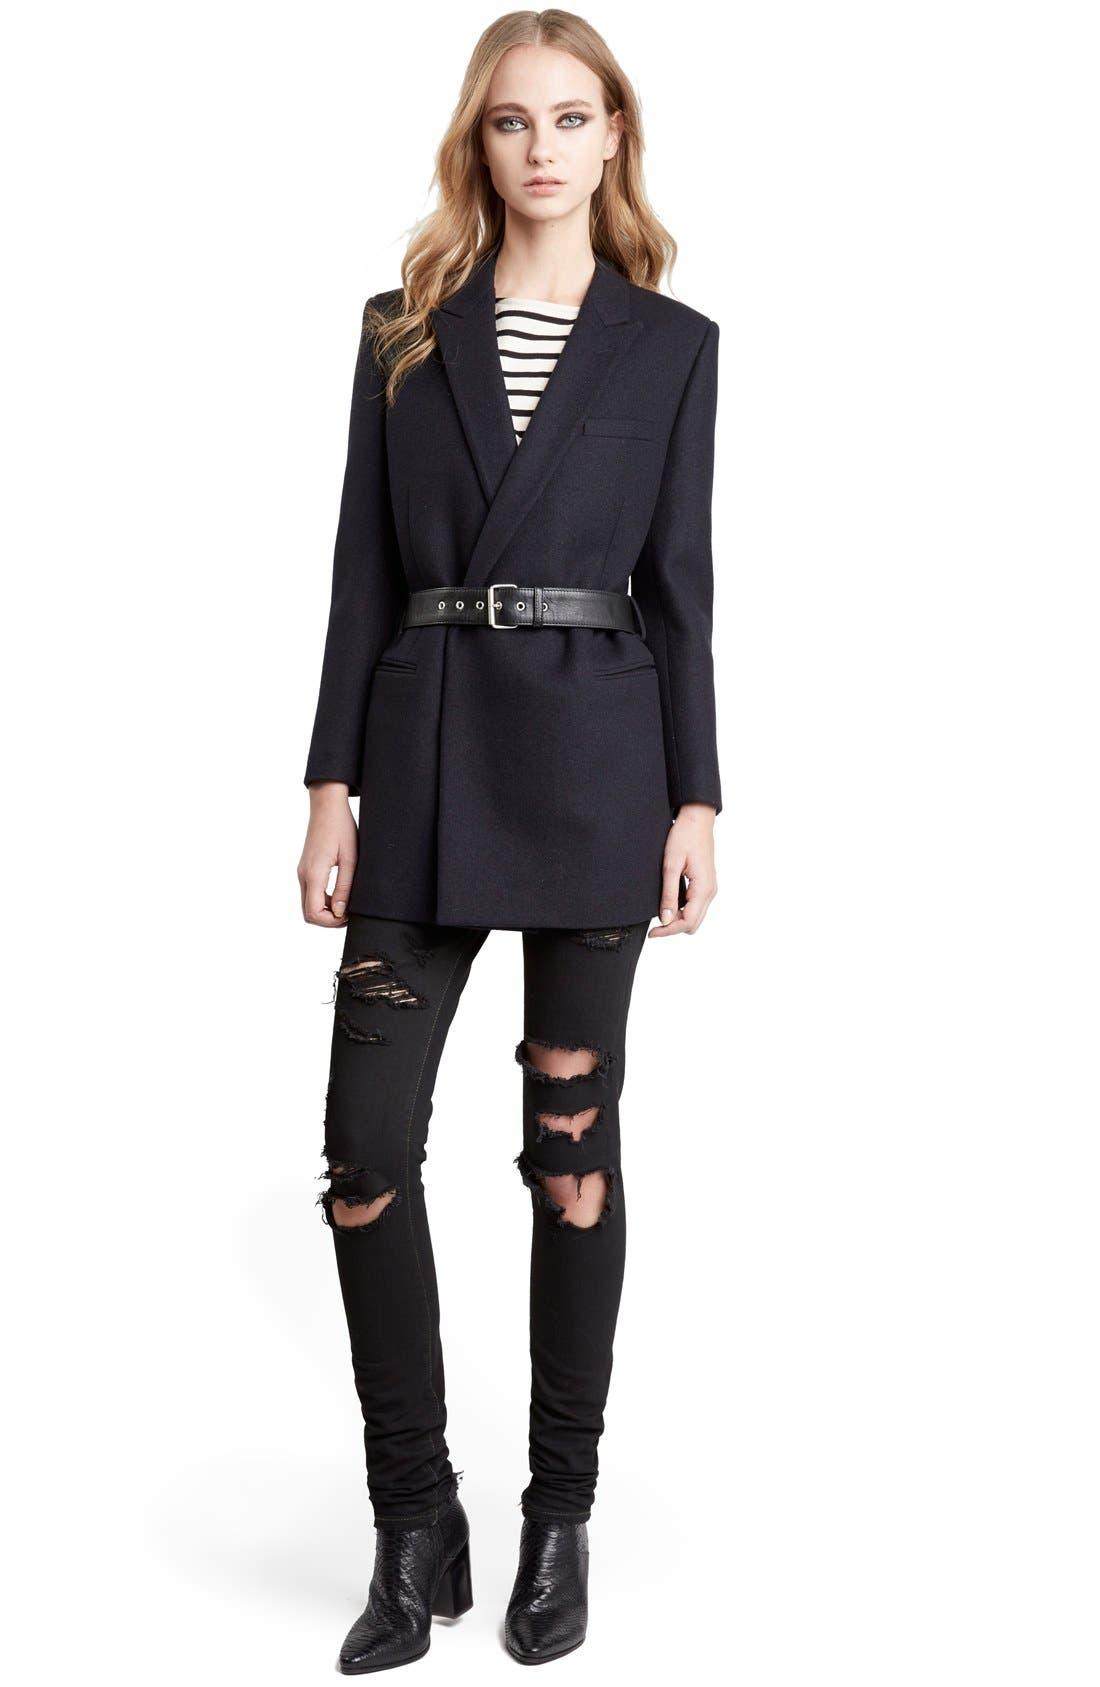 Alternate Image 1 Selected - Saint Laurent Wool Coat with Belt